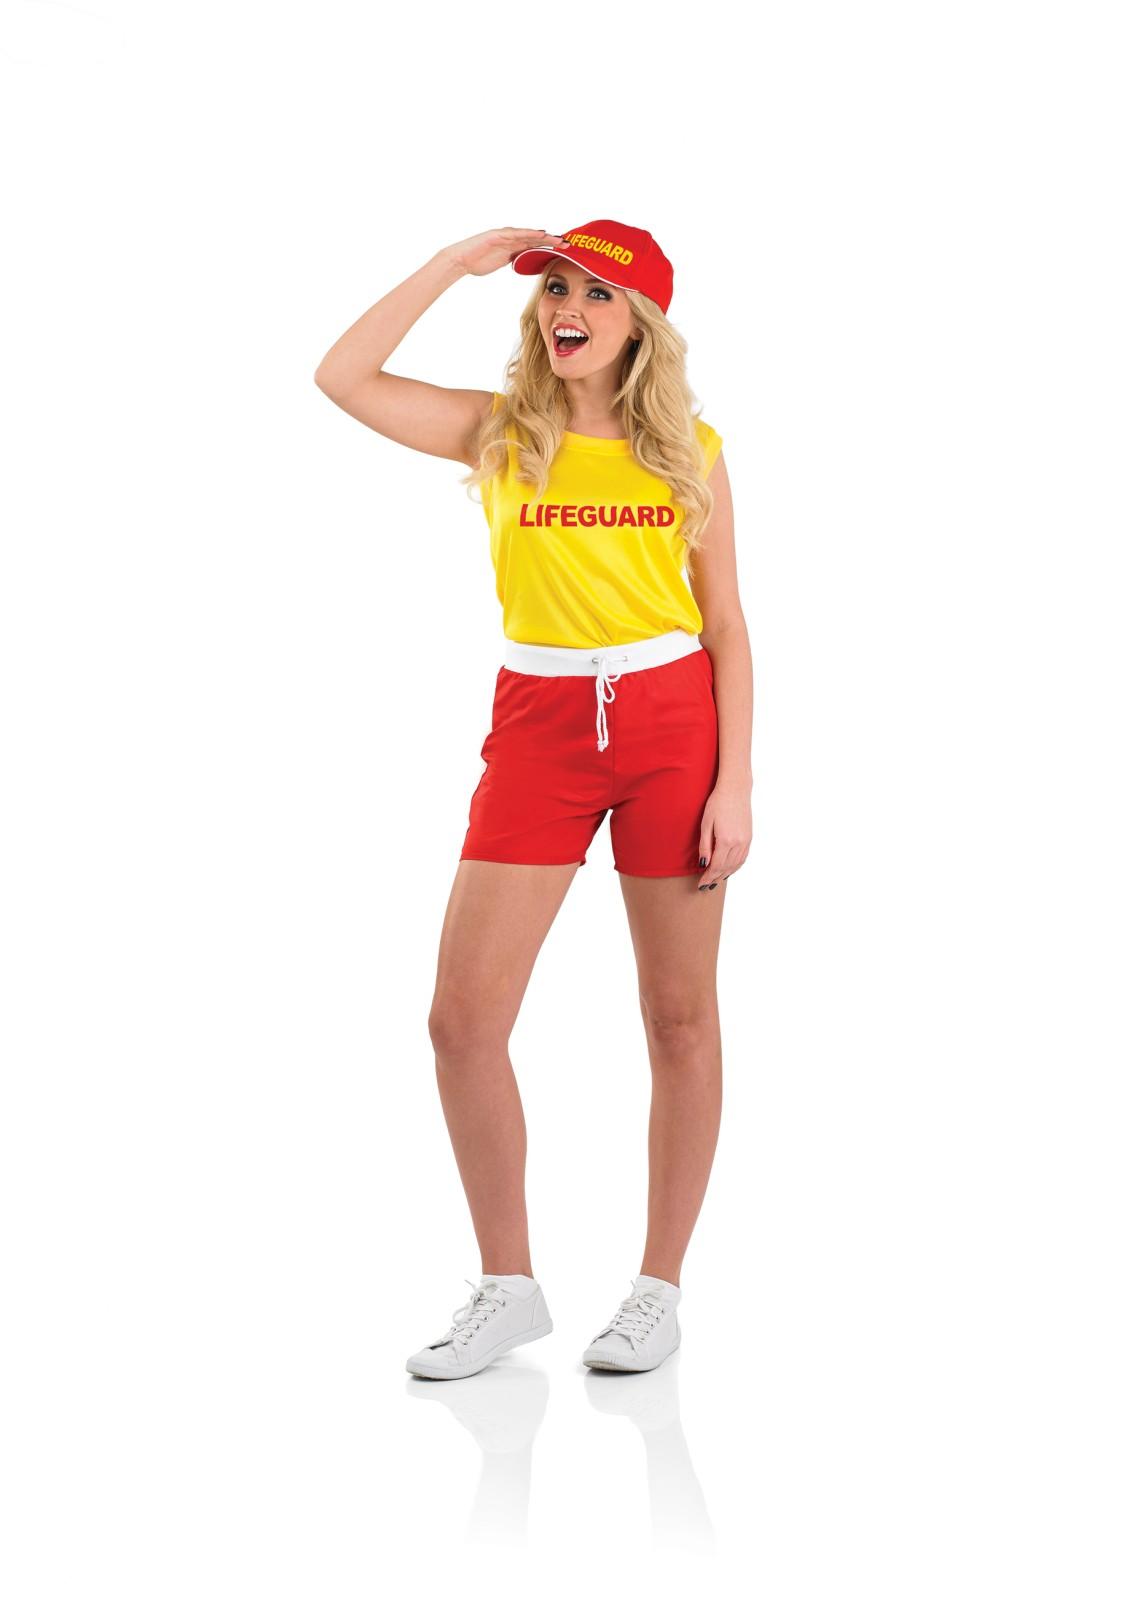 Ladies Female Lifeguard Costume For 90s Bay Fancy Dress ...  Ladies Female L...